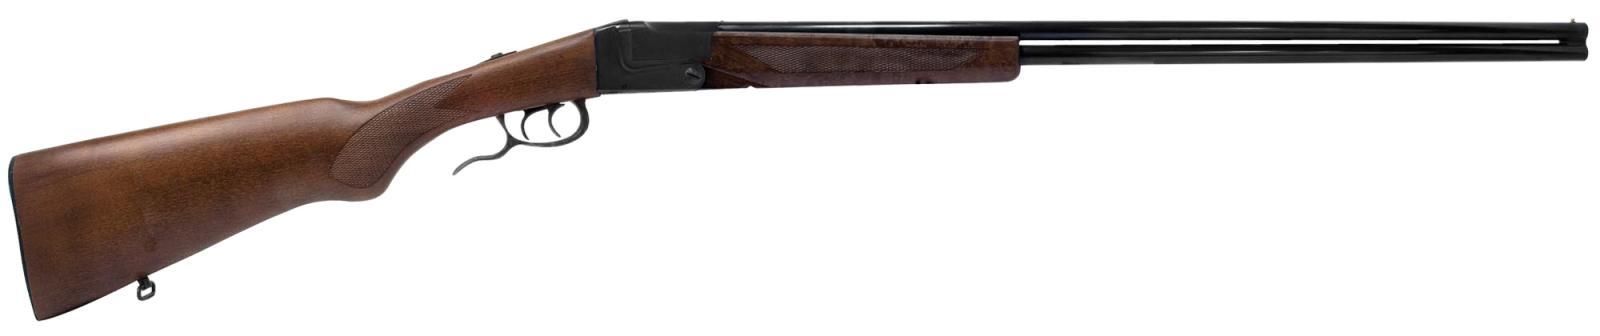 Fusil superposé pliant FLACO Cal. 410 ou 14 mm